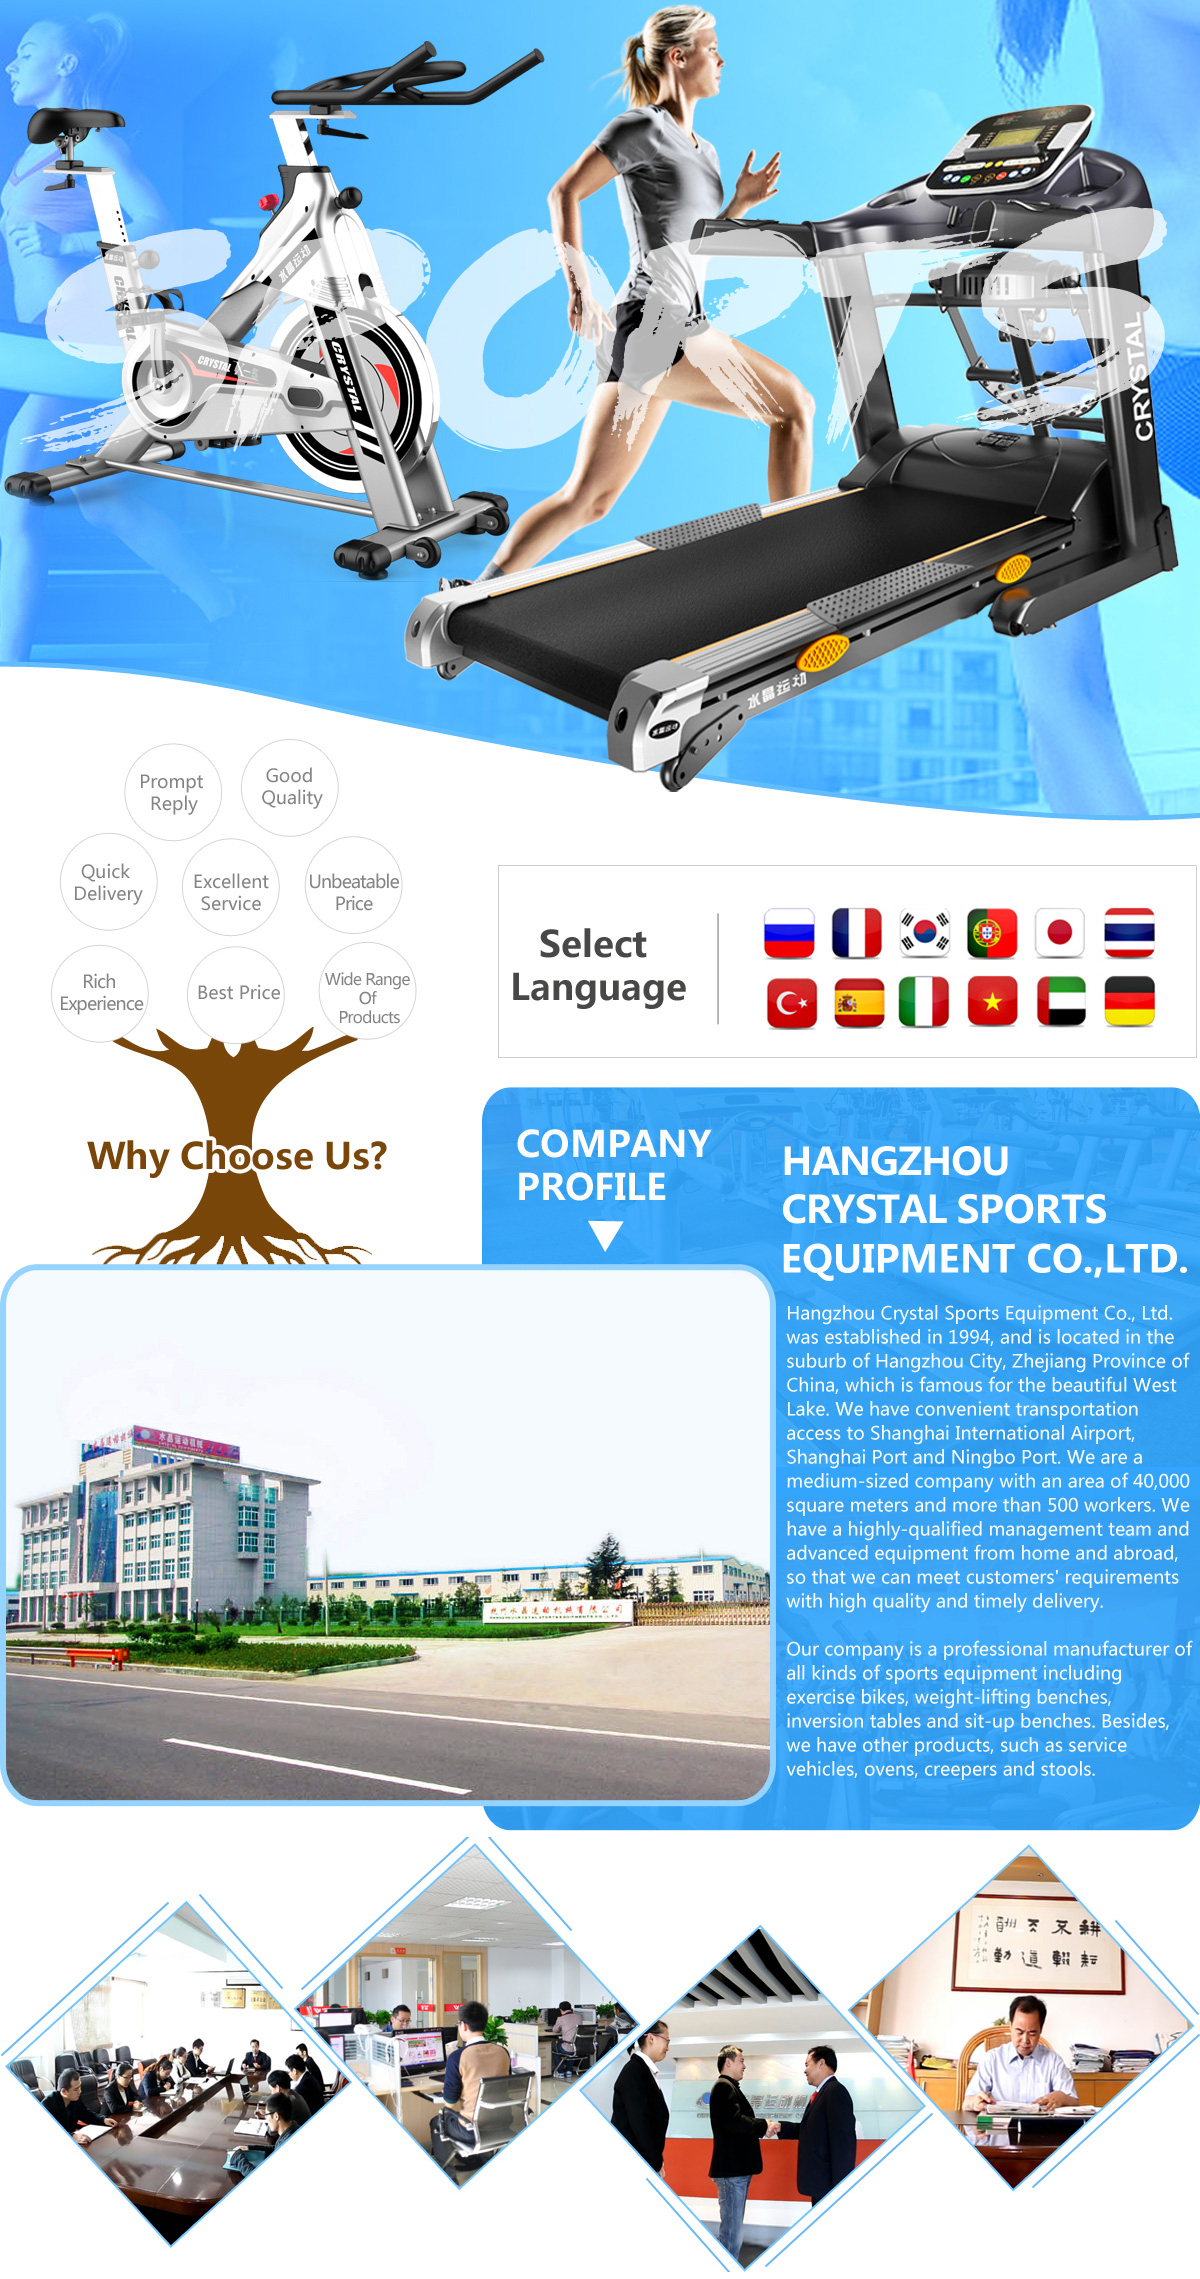 Hangzhou Crystal Sports Equipments Co Ltd Exercise